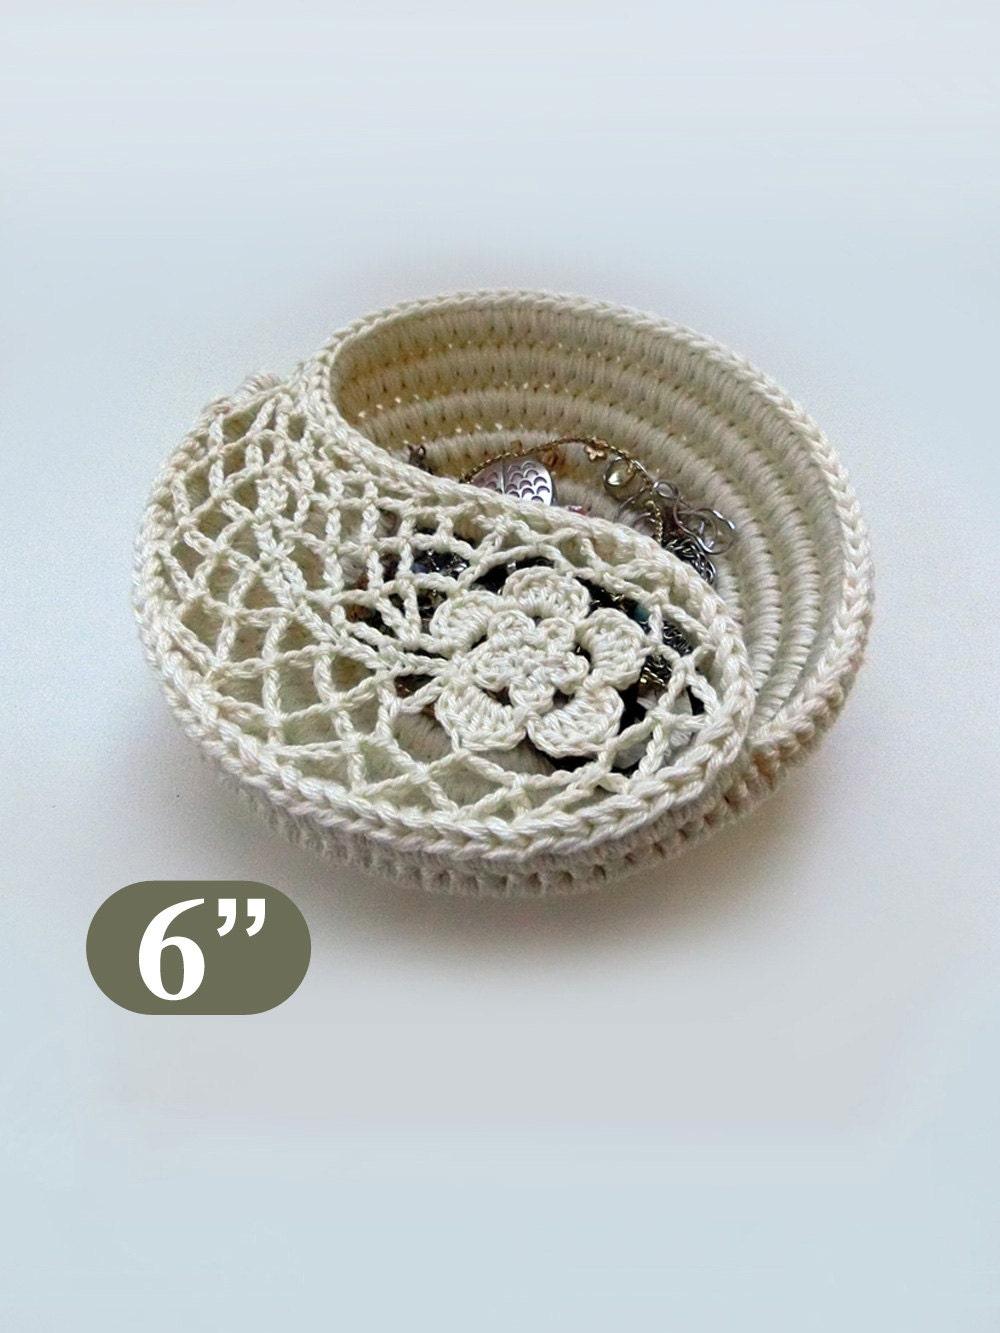 Crochet Pattern 6 Yin Yang Jewelry Dish Crochet Home Etsy